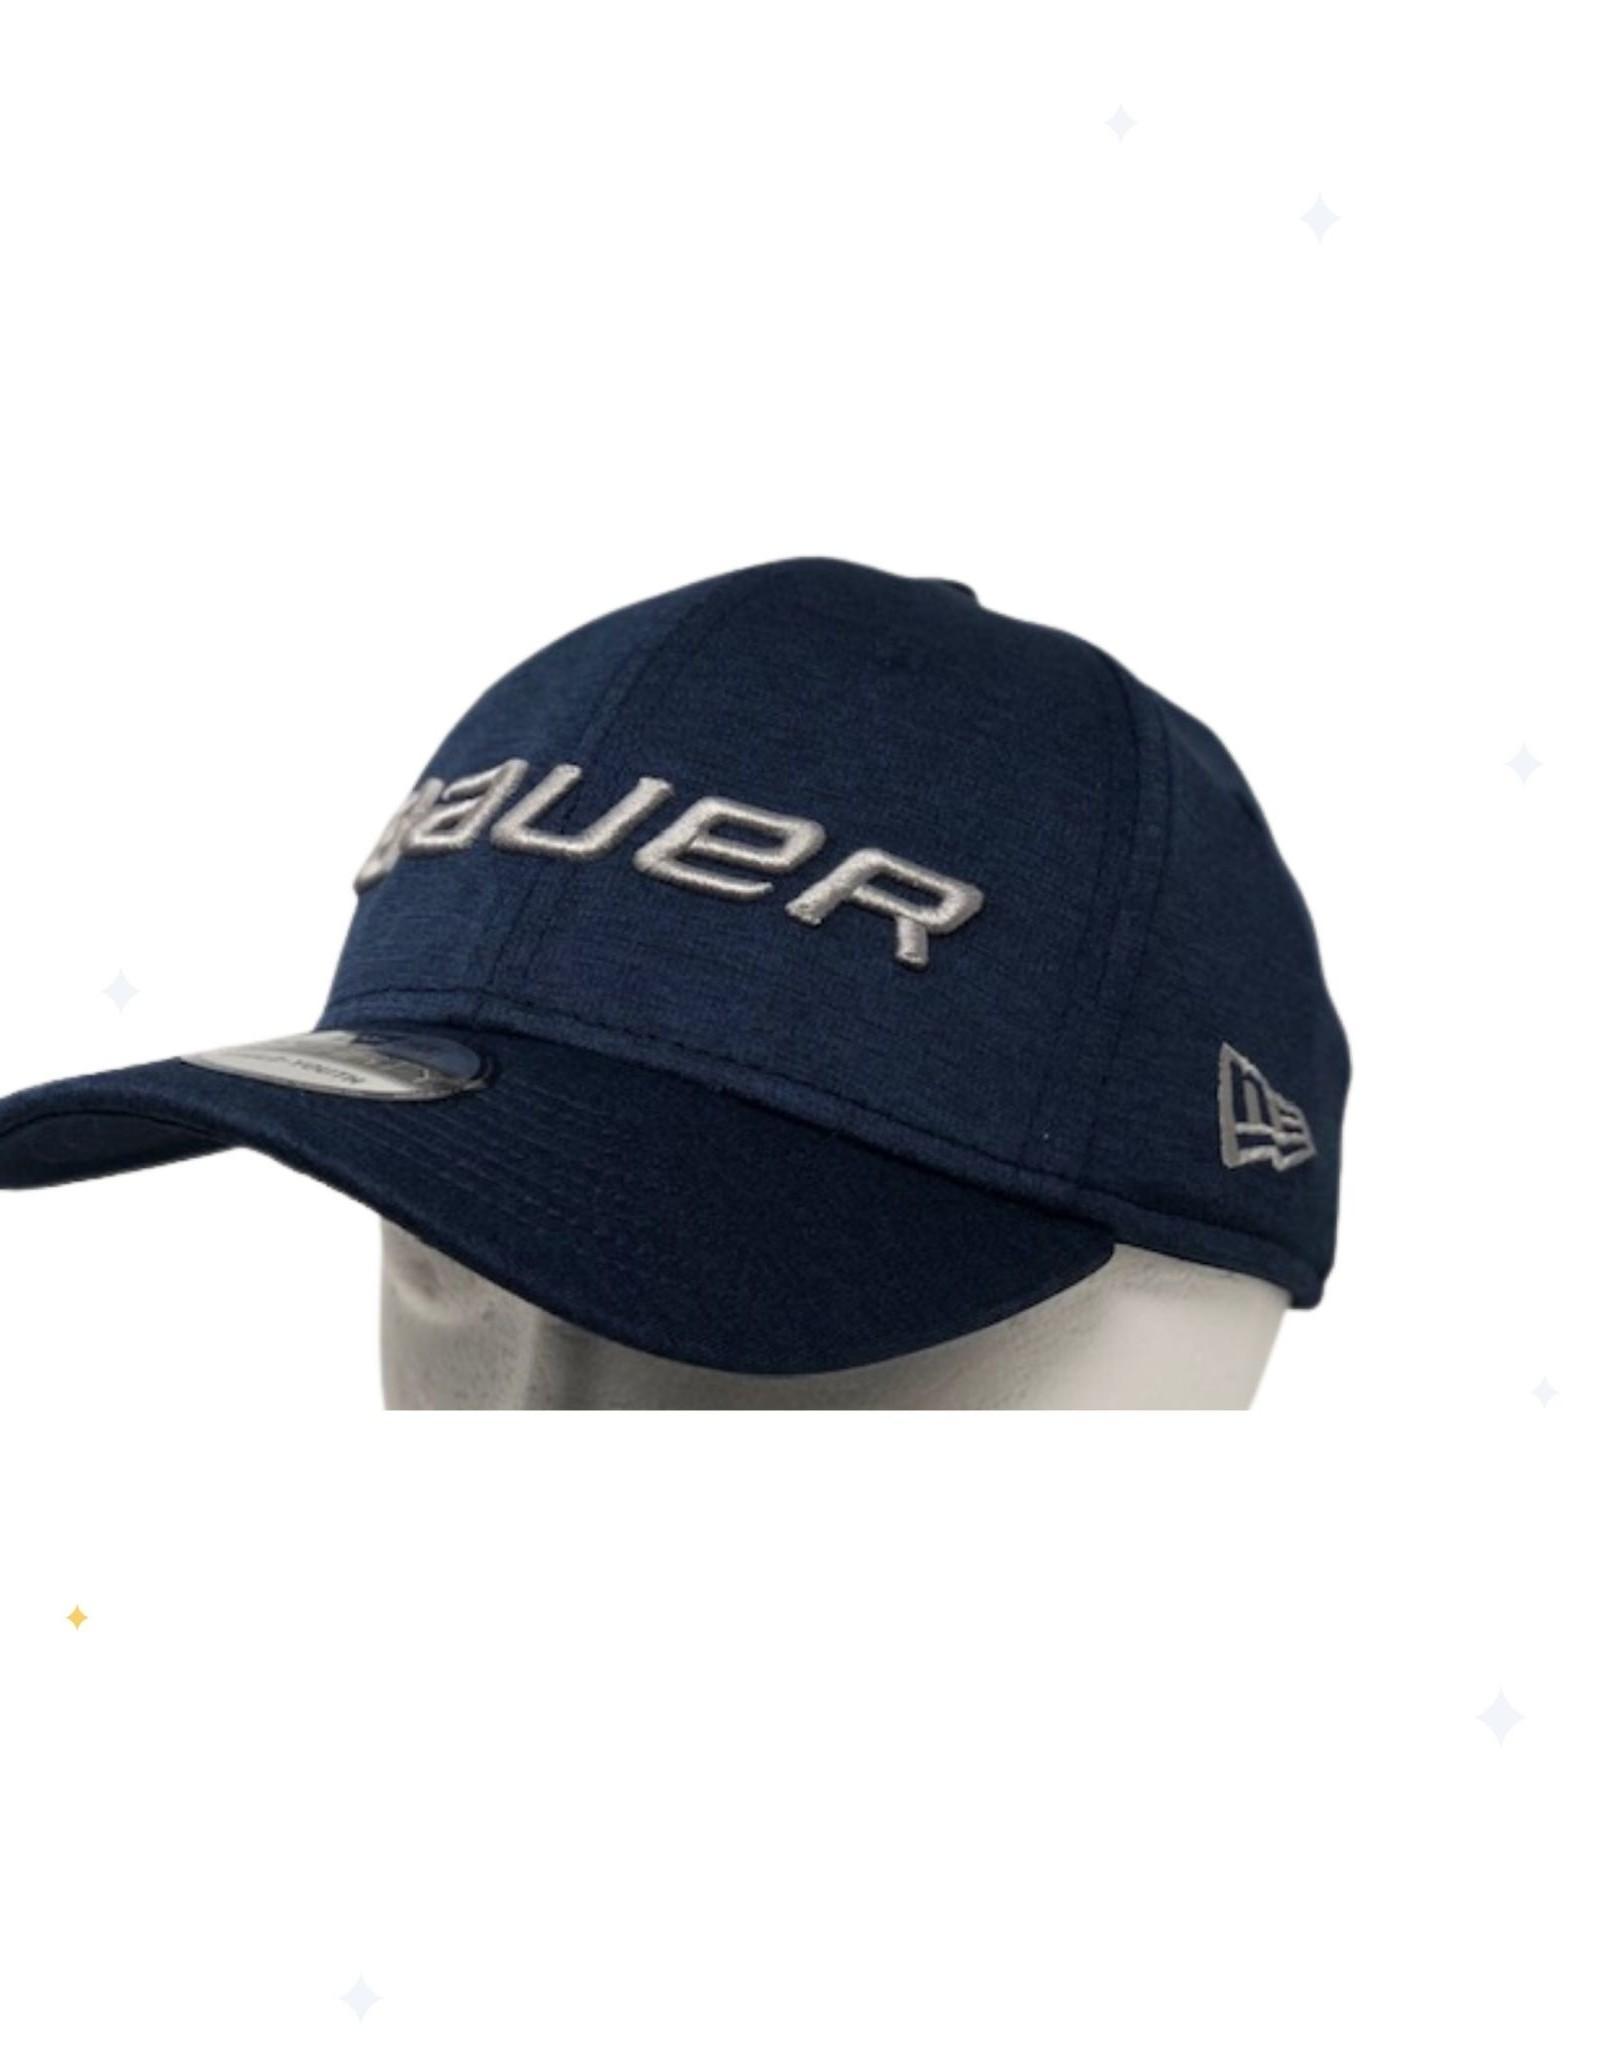 Bauer STP Bauer SP Logo 3930 Hat (SM/MD)